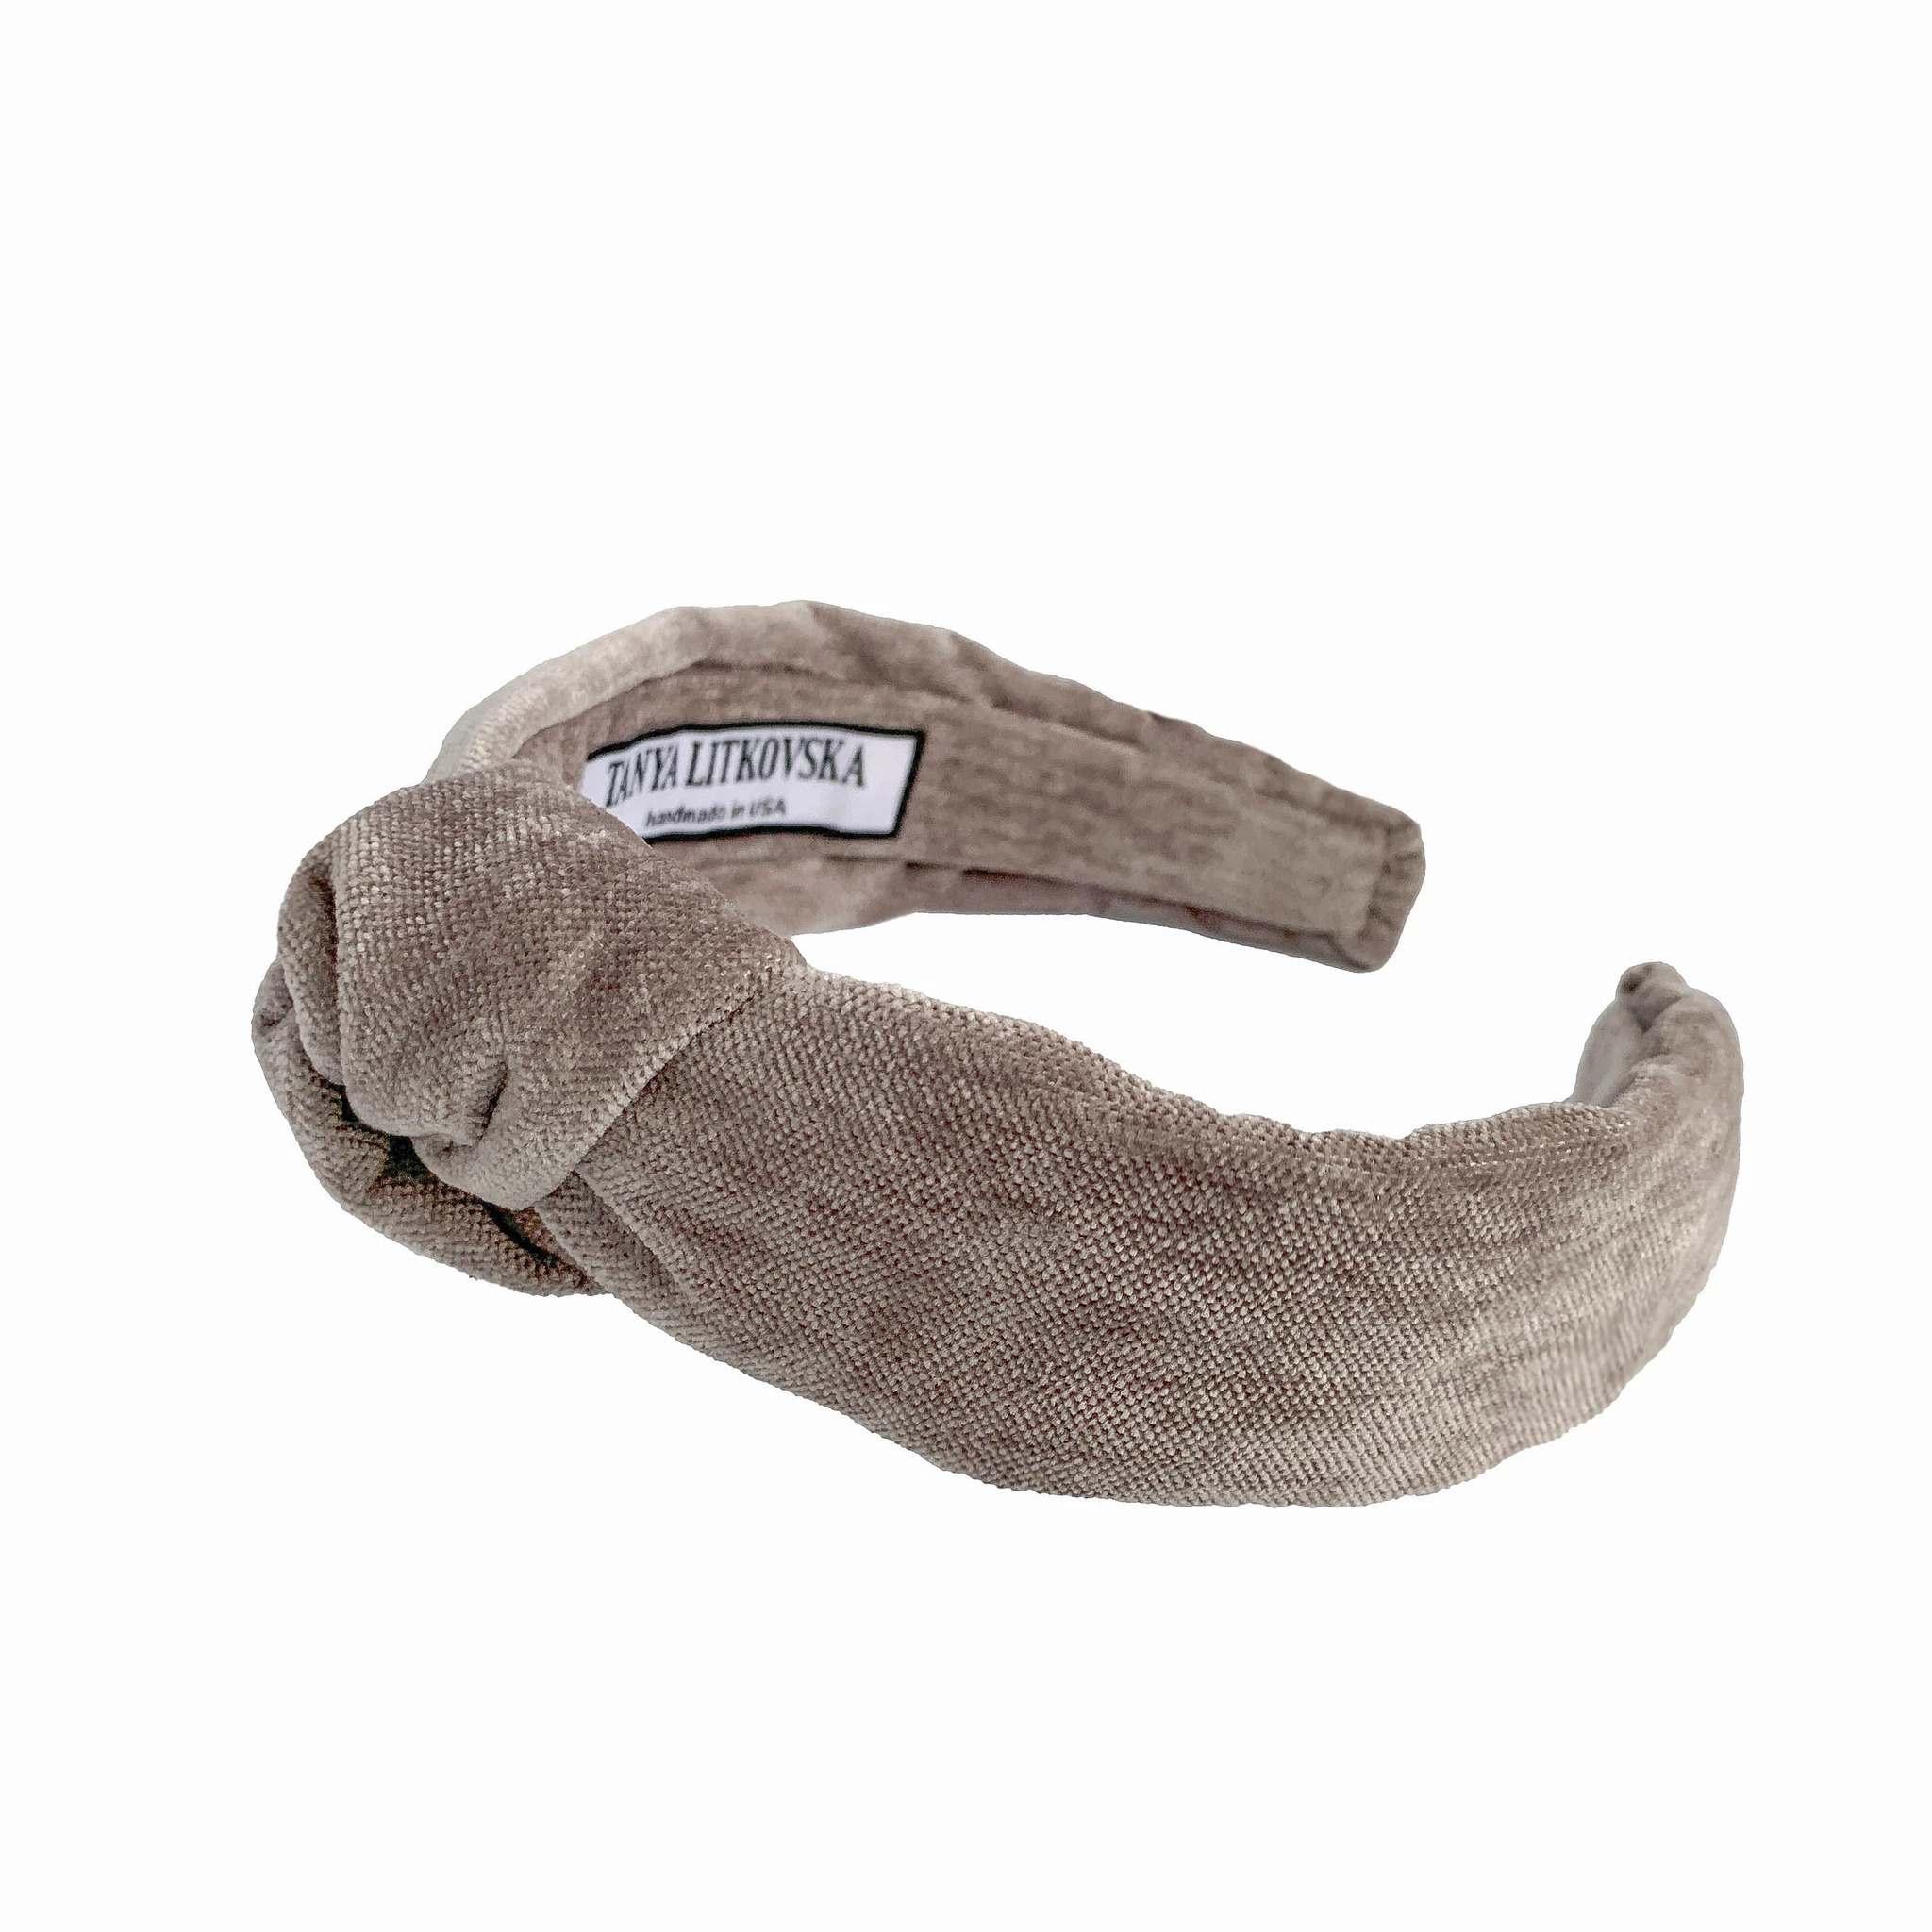 Tanya litkovska Women's Velvet Knotted Headband in Grey